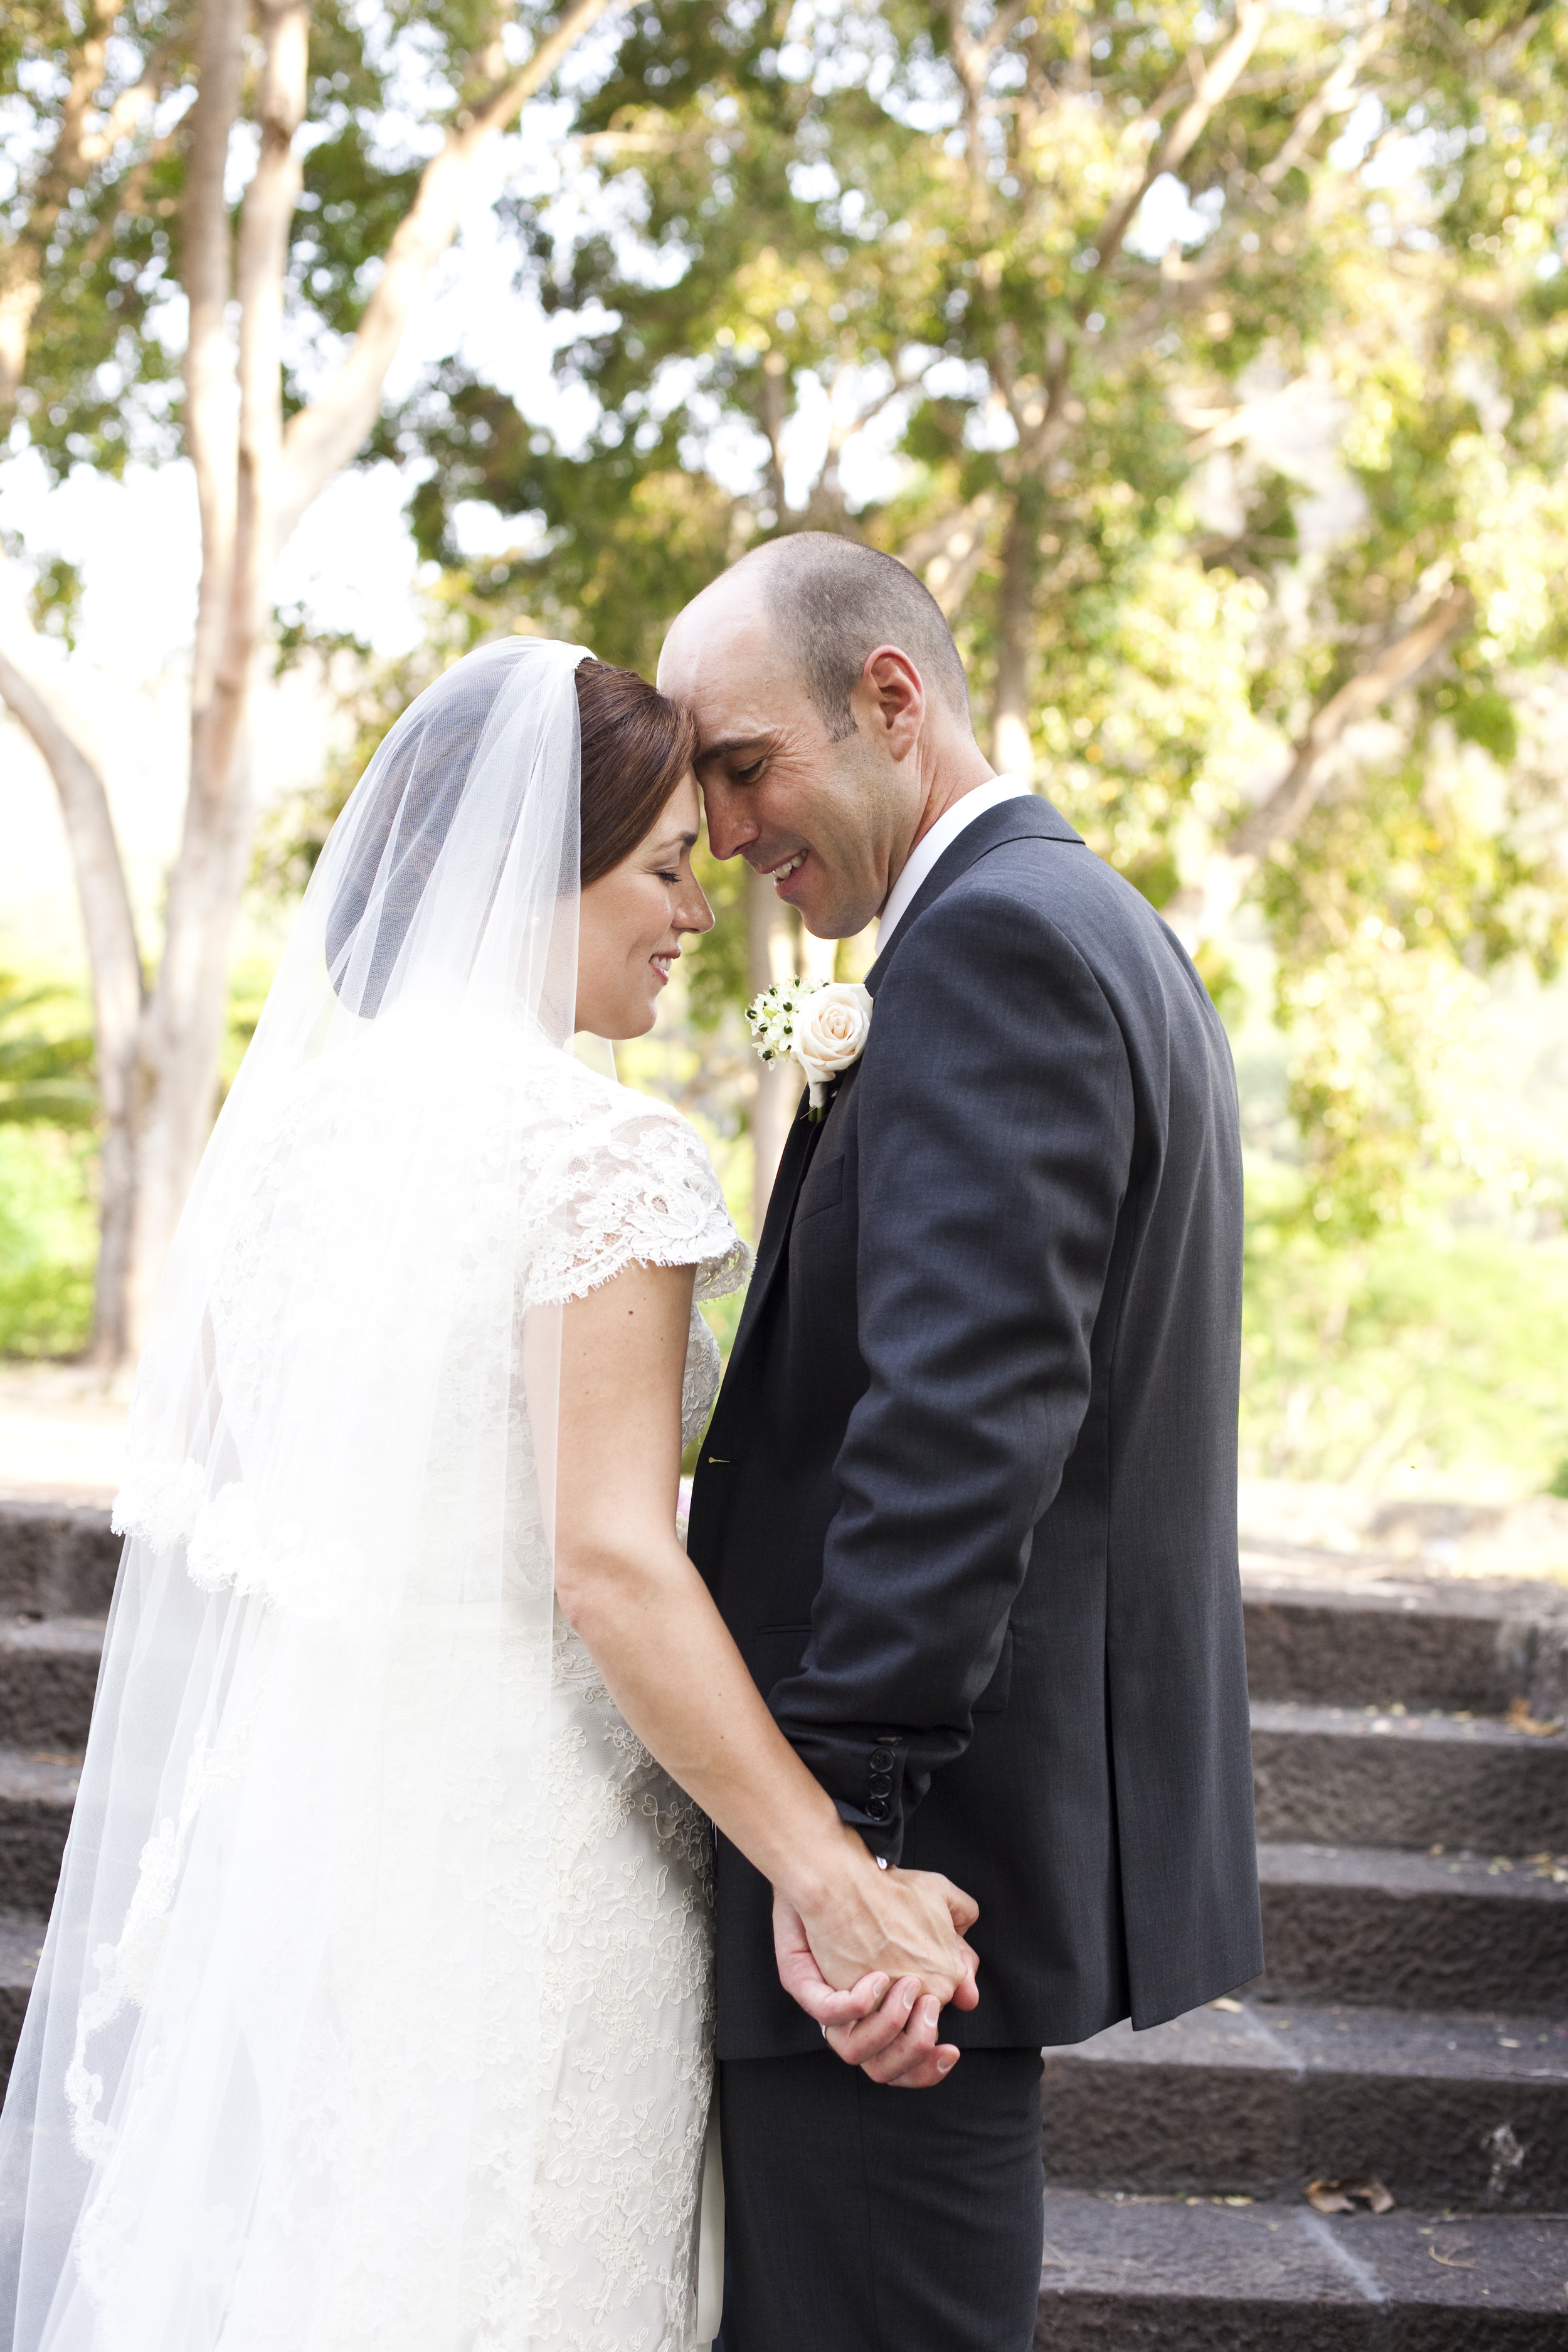 Ceci_New_York_Style_Luxury_Custom_Mexico_Wedding_CeciBride_Letterpress_NewYork_Foil_Hacienda_de_San_Antonio_31.jpg